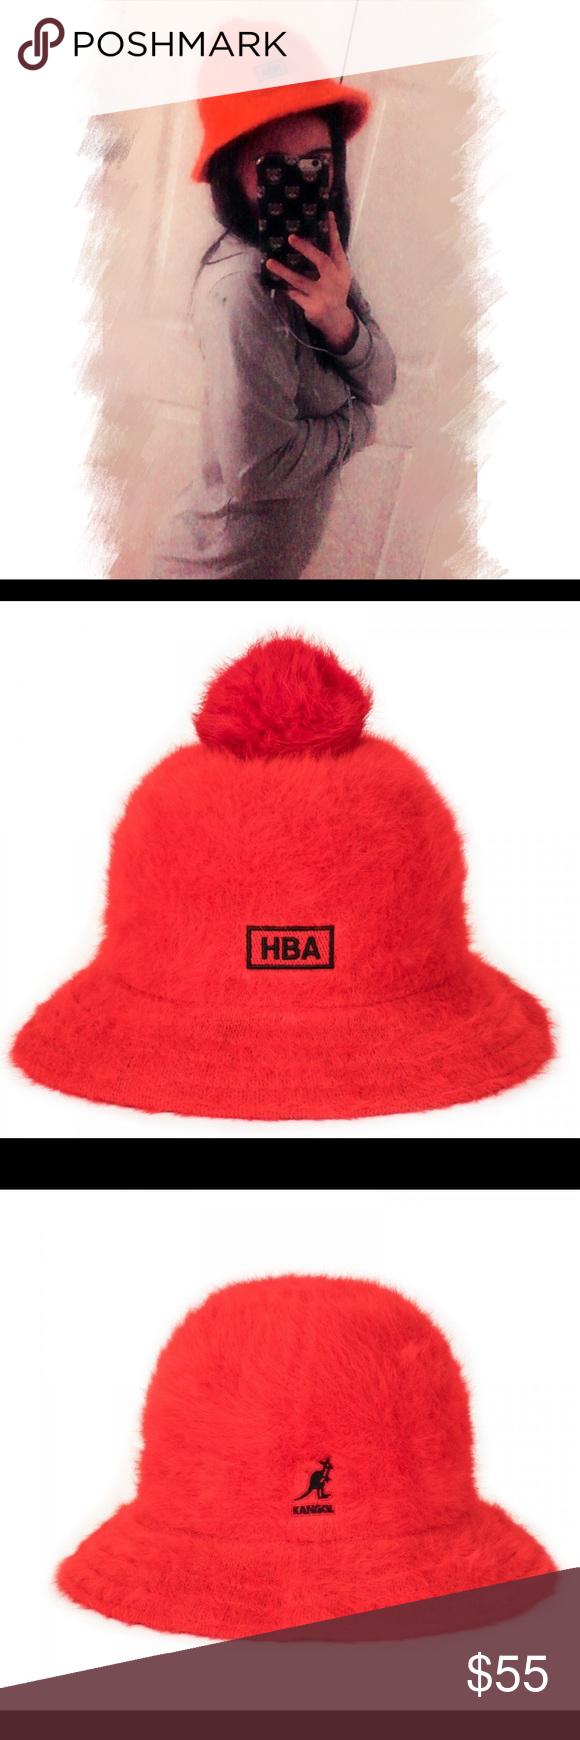 9b2858bc1a5d5 Brand New HBA FURGORA CASUAL KANGOL HBA HAS COLLABORATED WITH BRITISH  HEADWEAR MAKERS KANGOL® ON